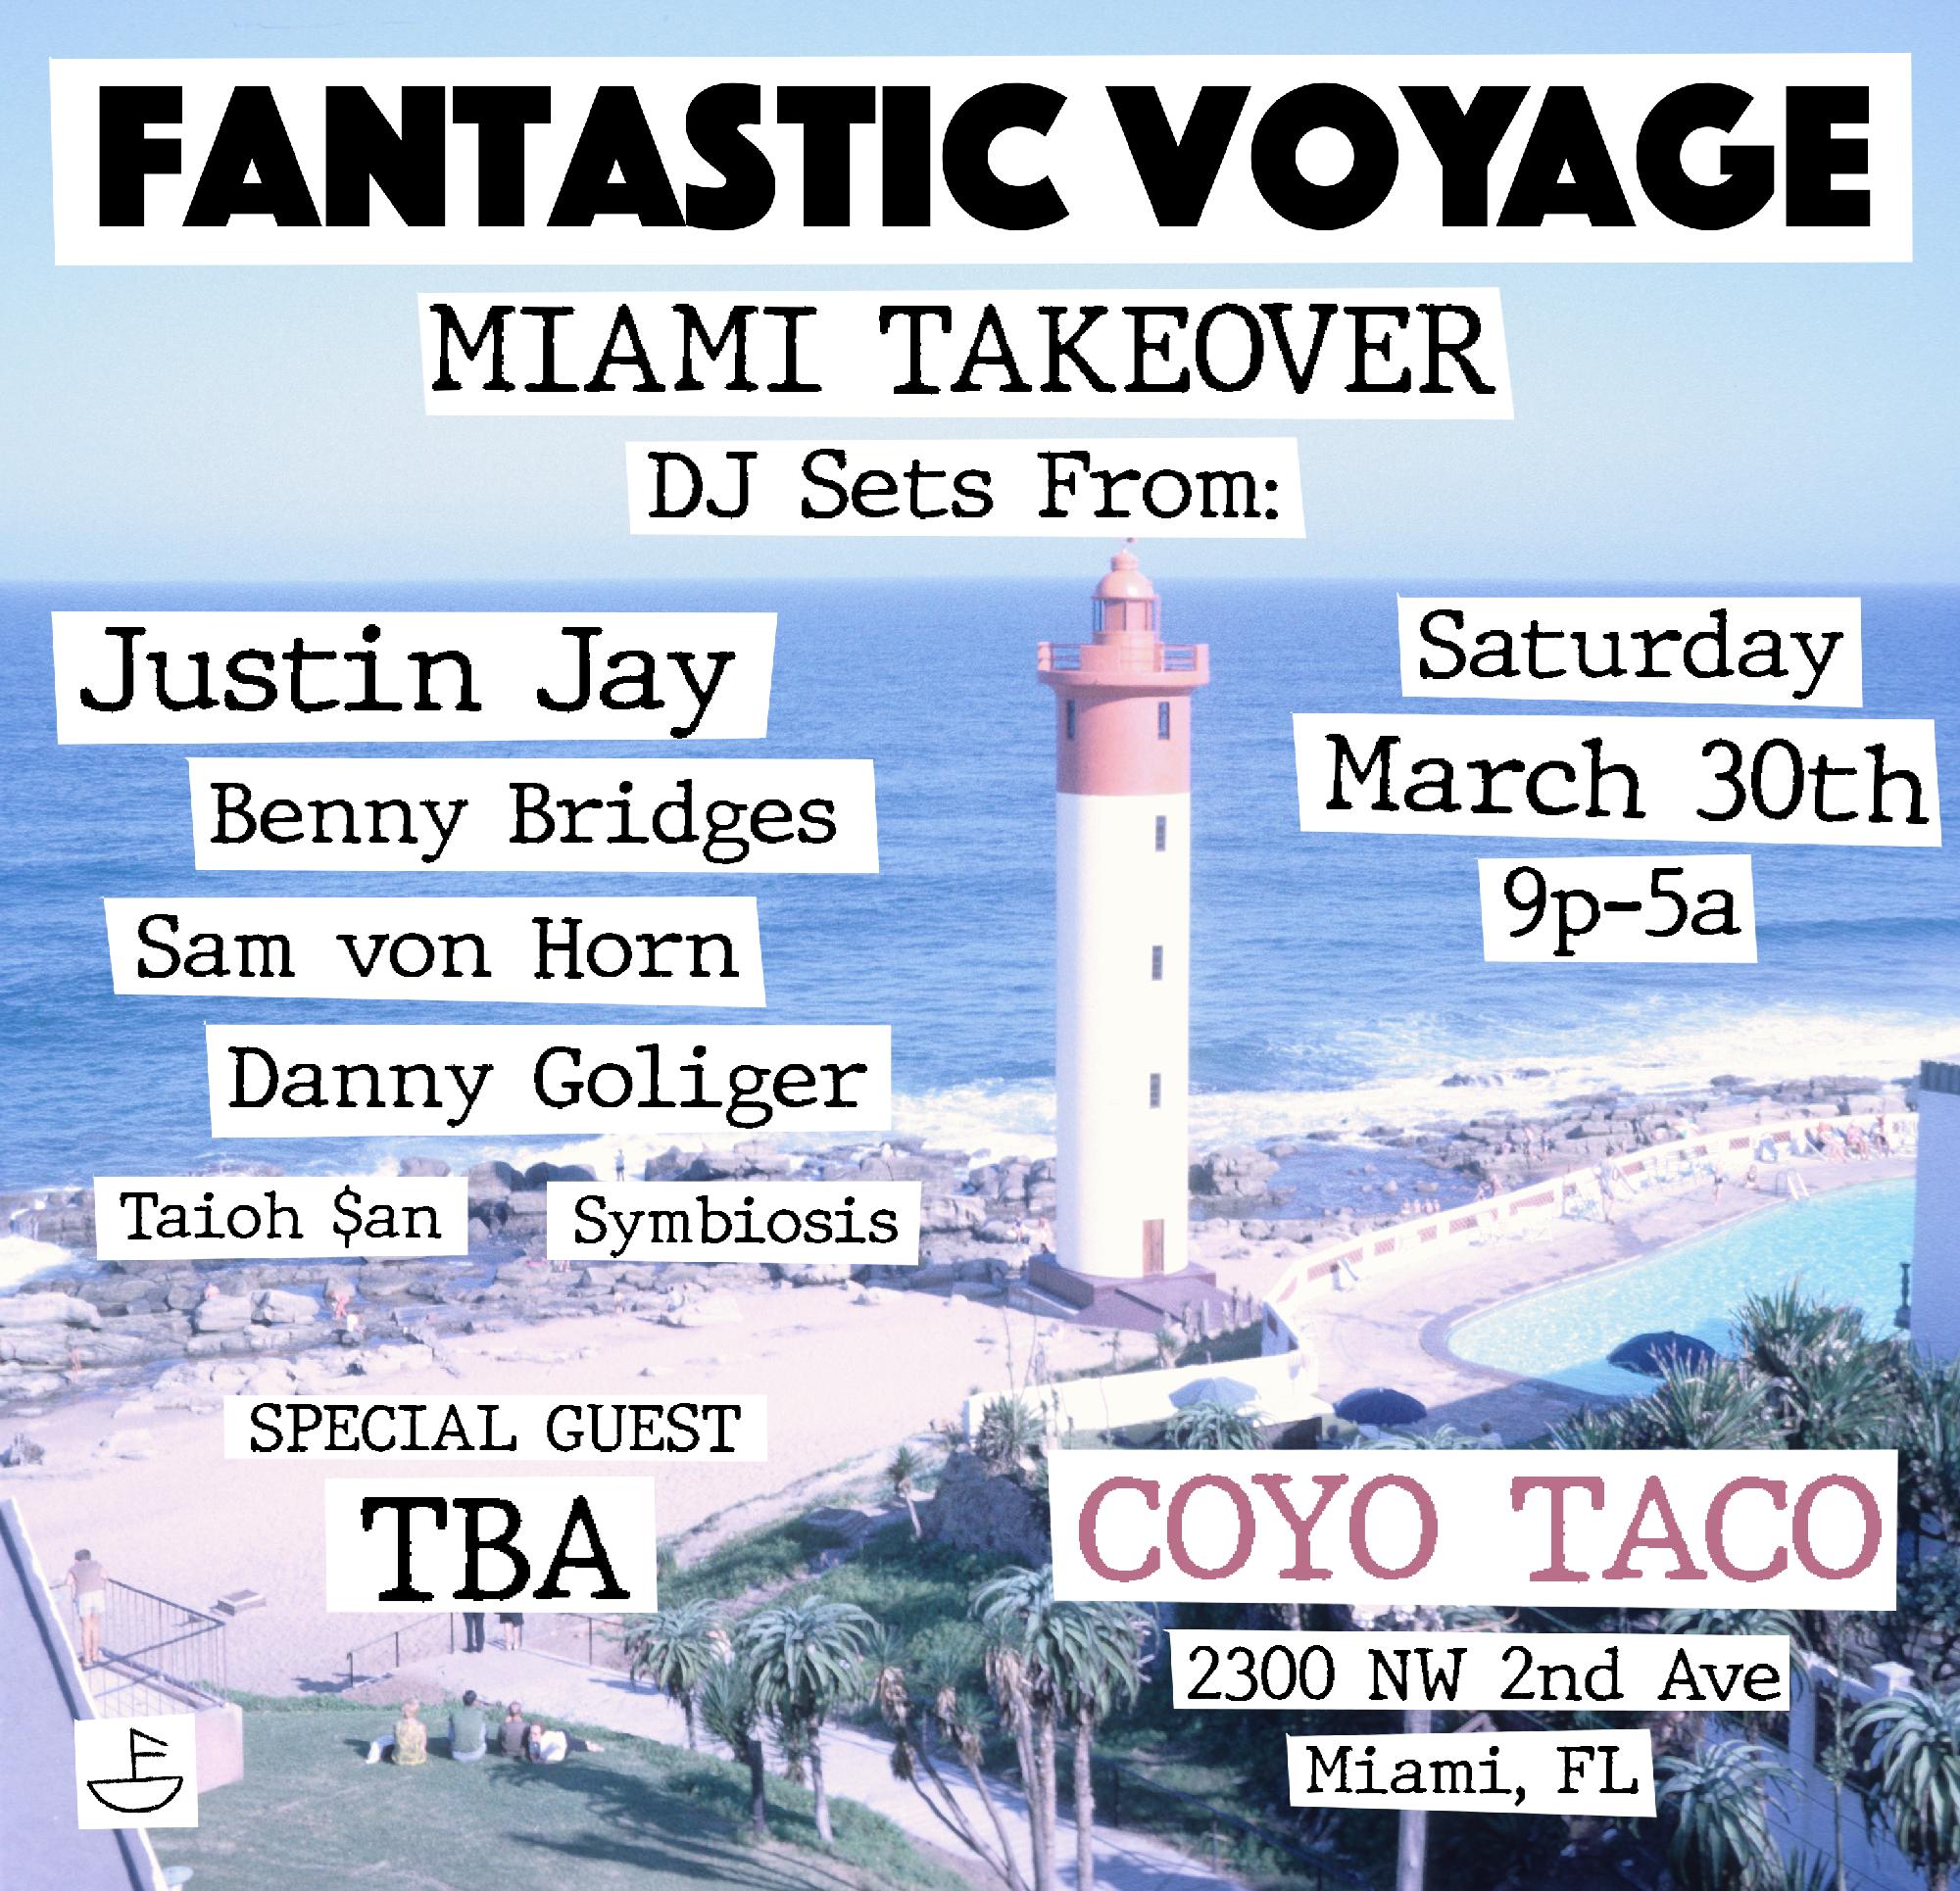 Justin Jay's Fantastic Voyage Image